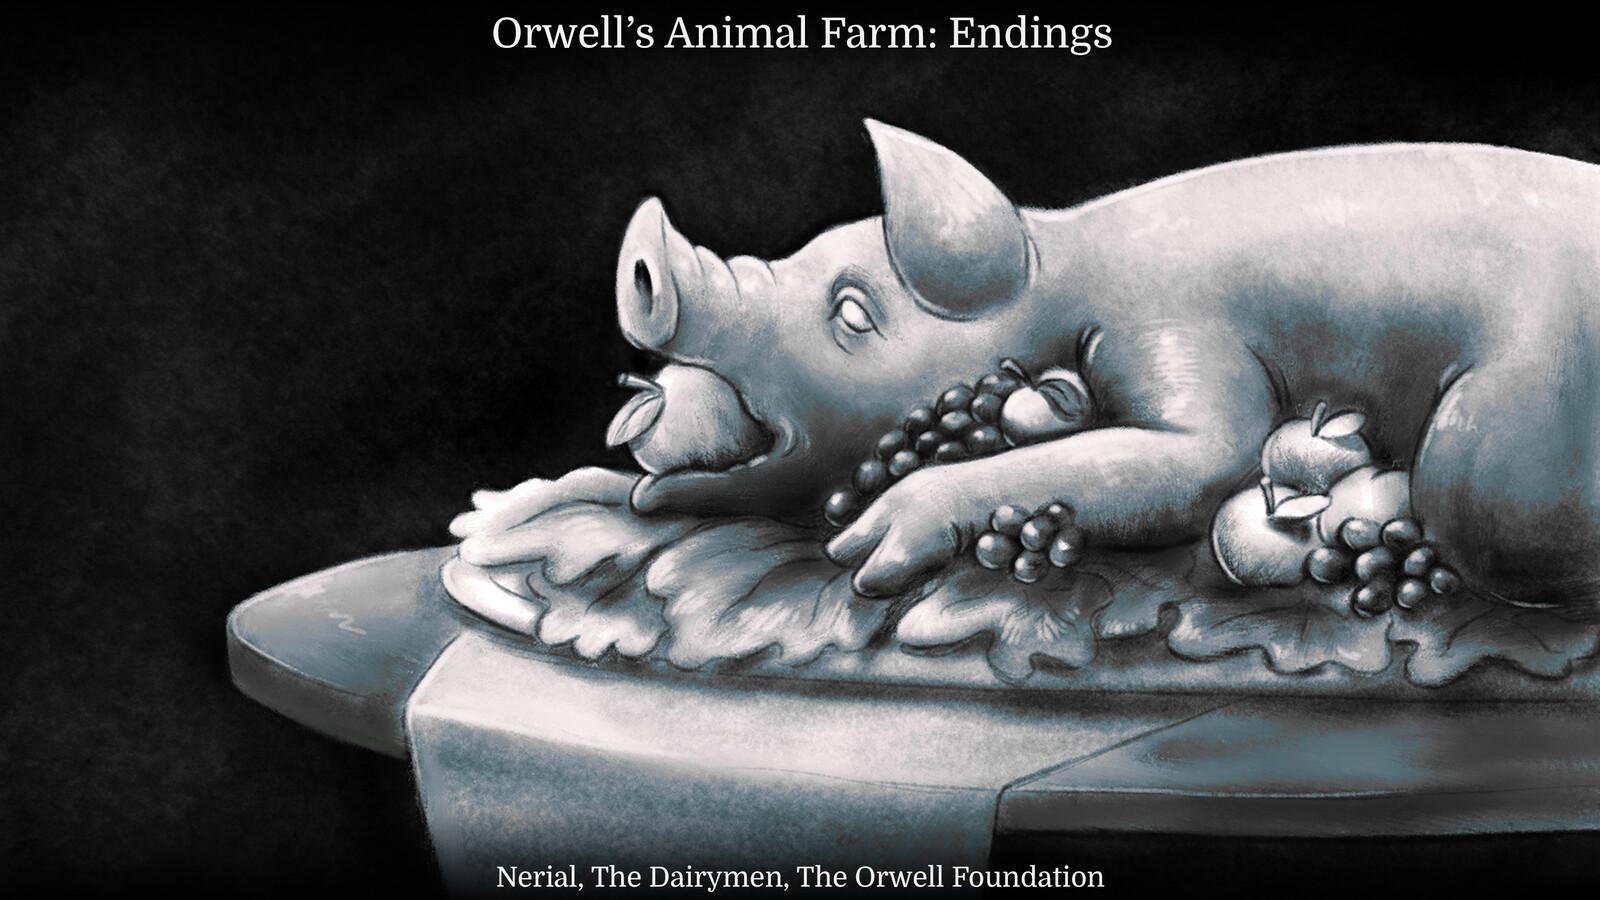 Orwell's Animal Farm: Endings